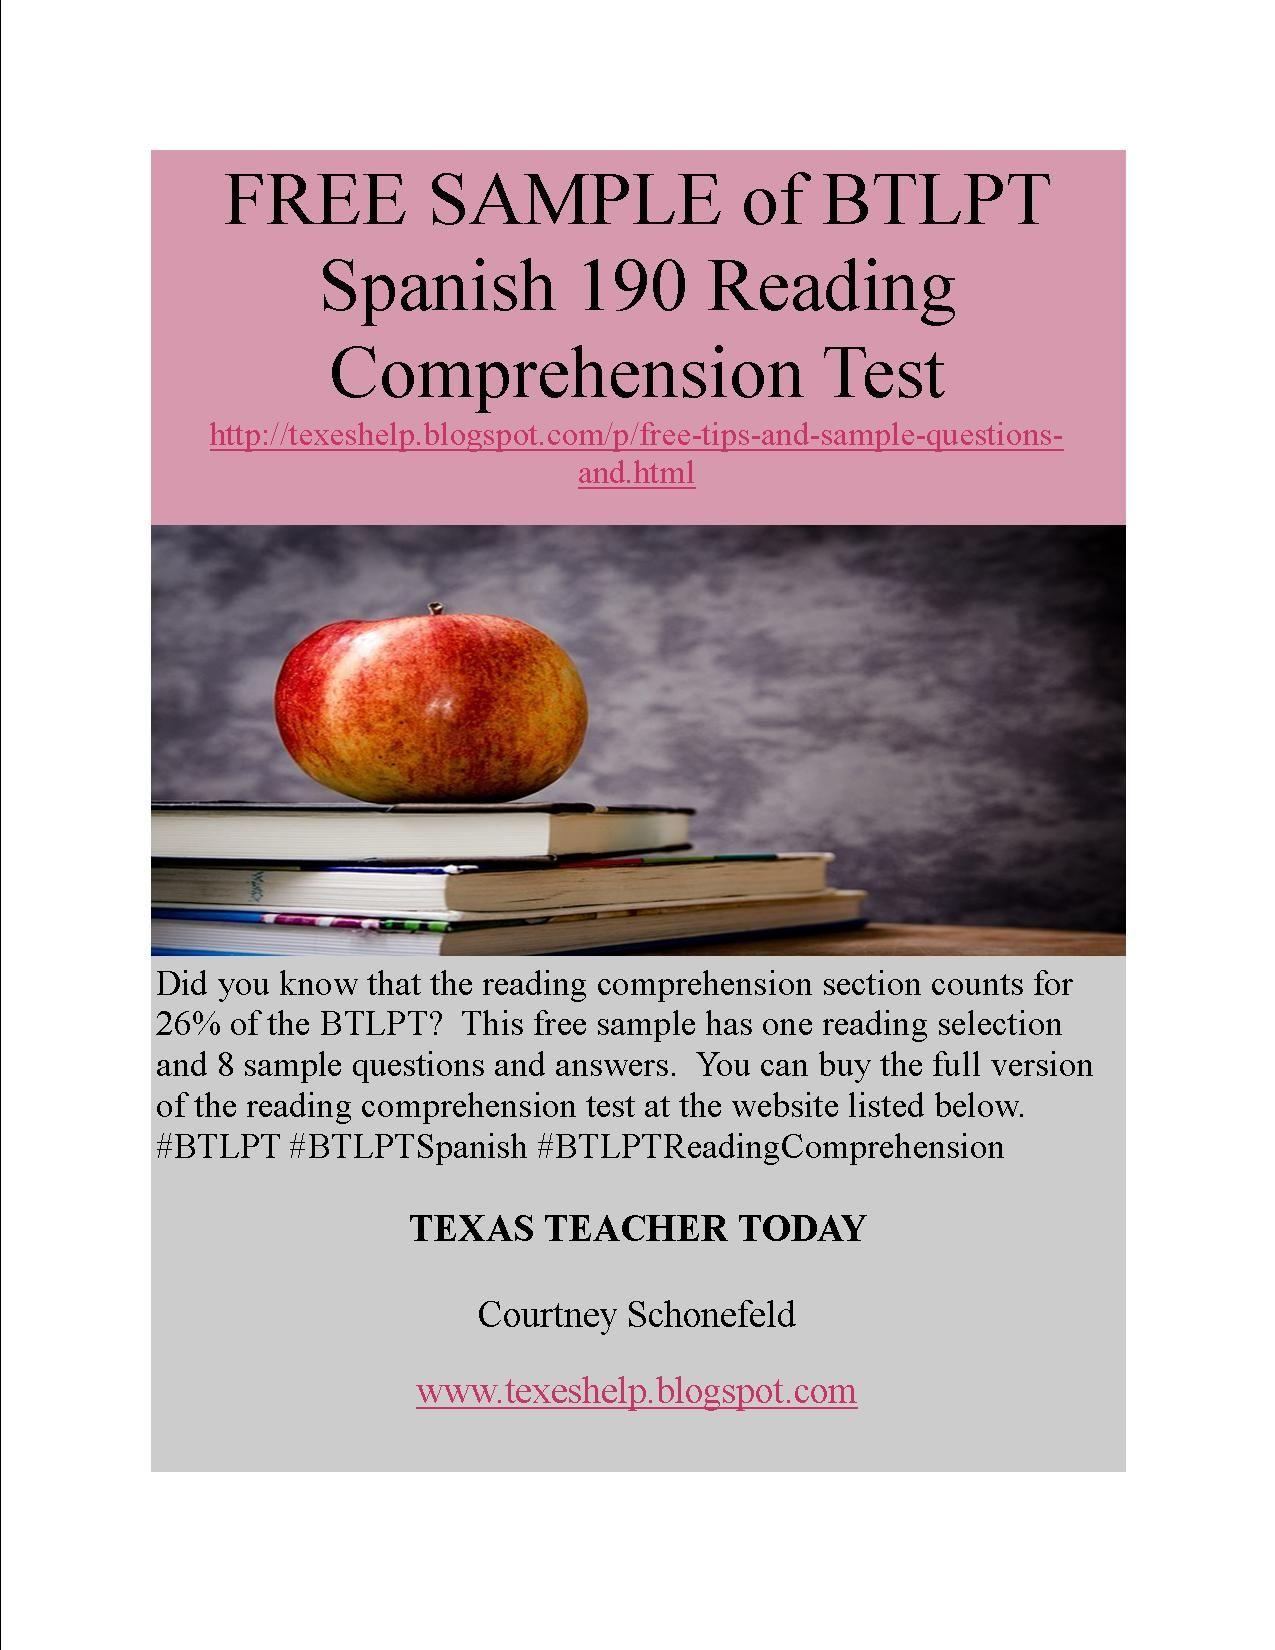 free sample of the btlpt spanish reading comprehension